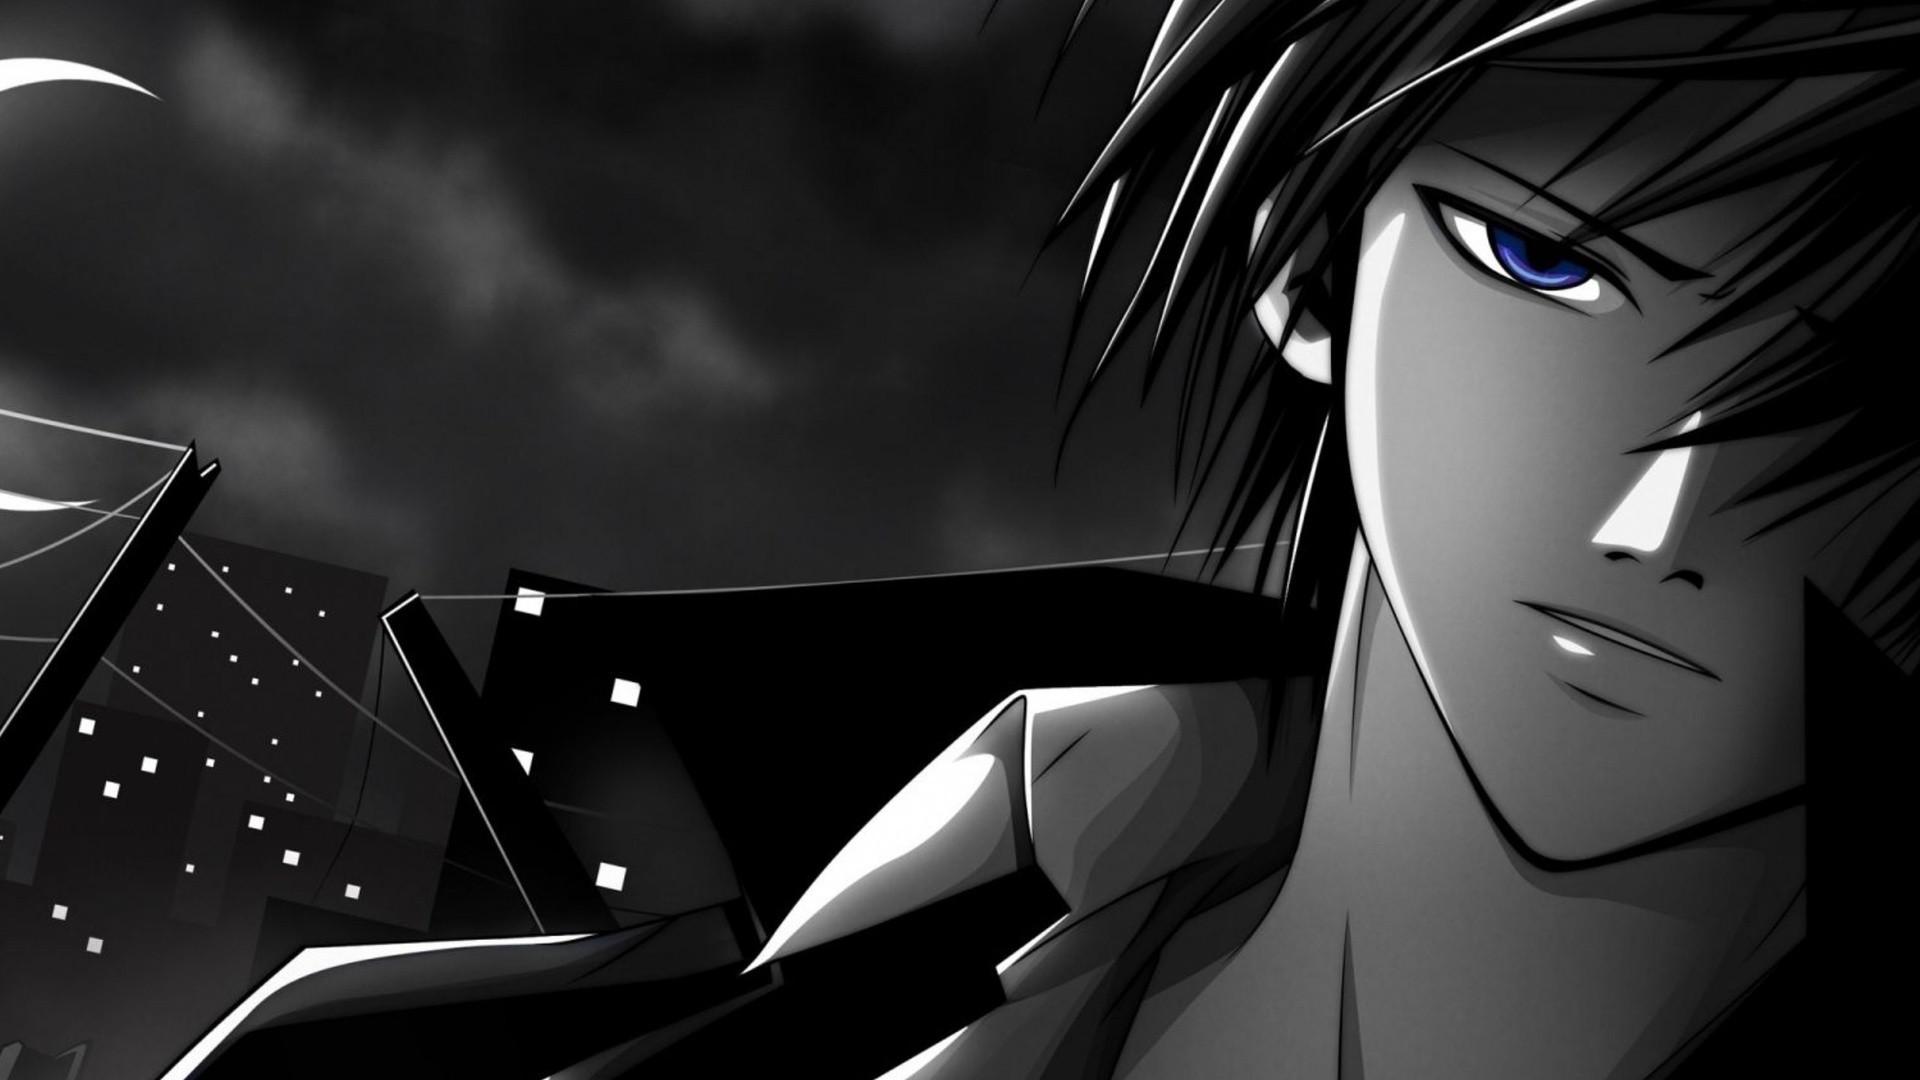 Handsome Anime Boy HD Download